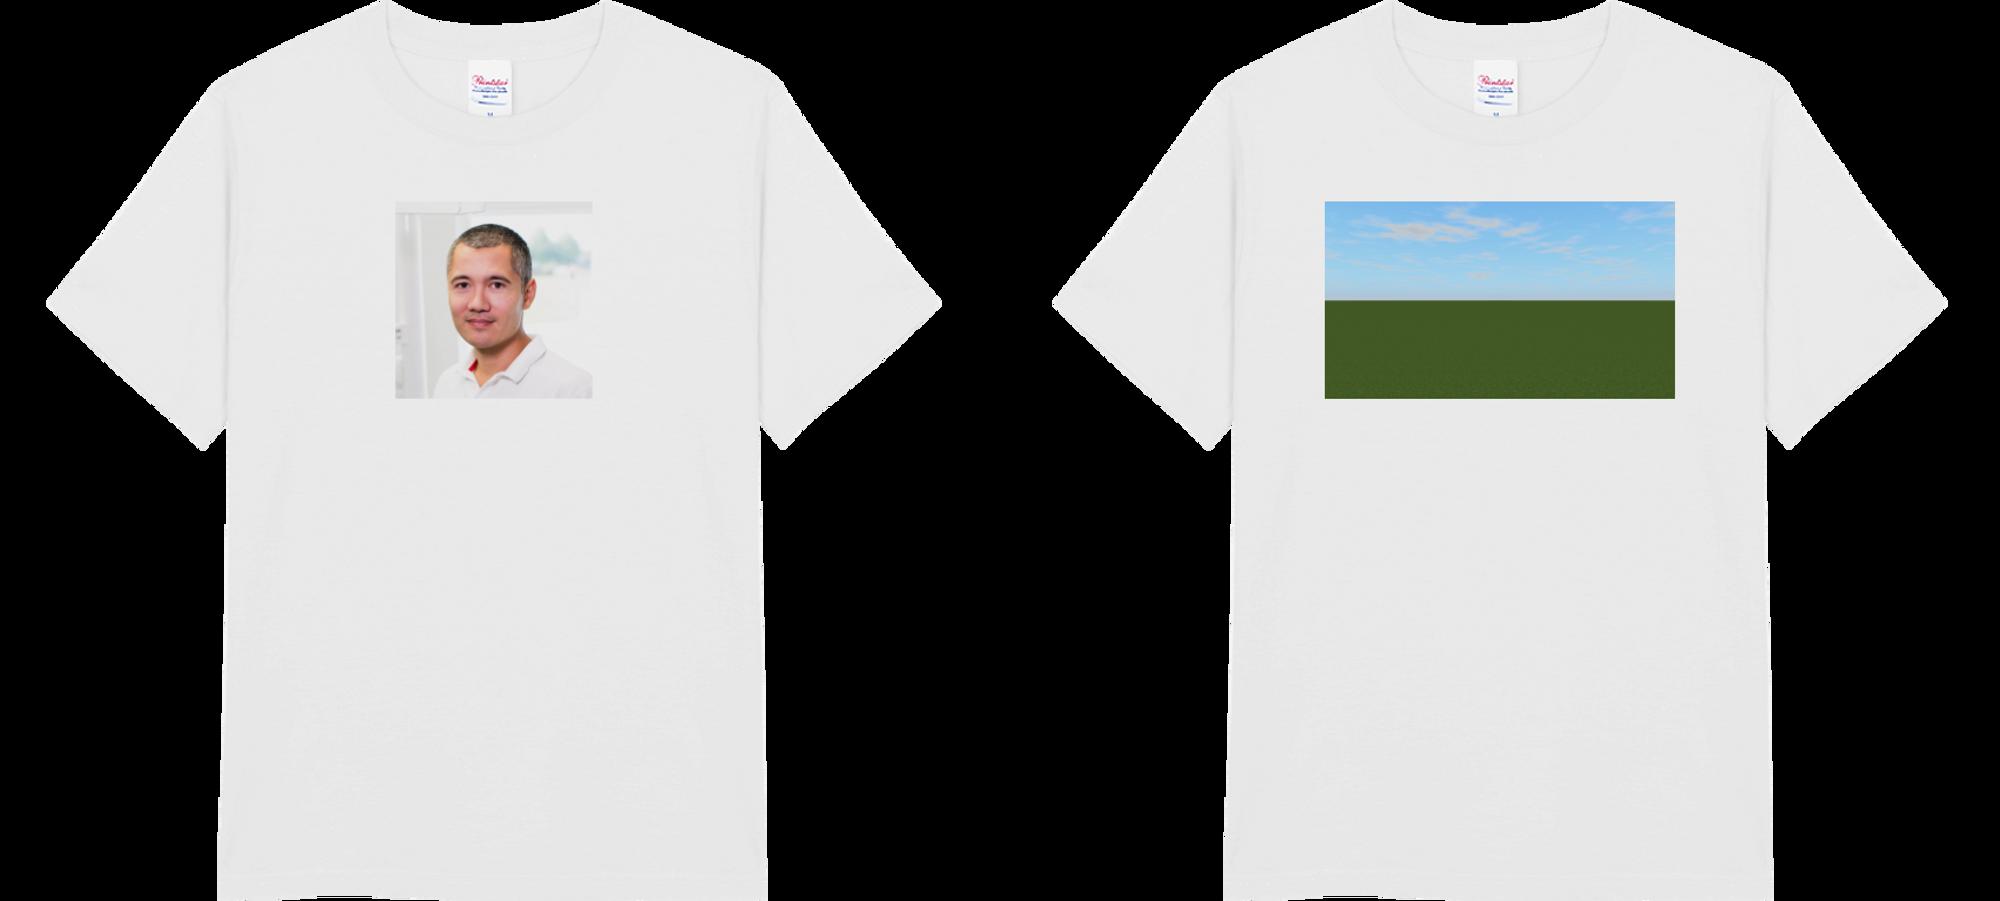 min-two-shirts-2.png